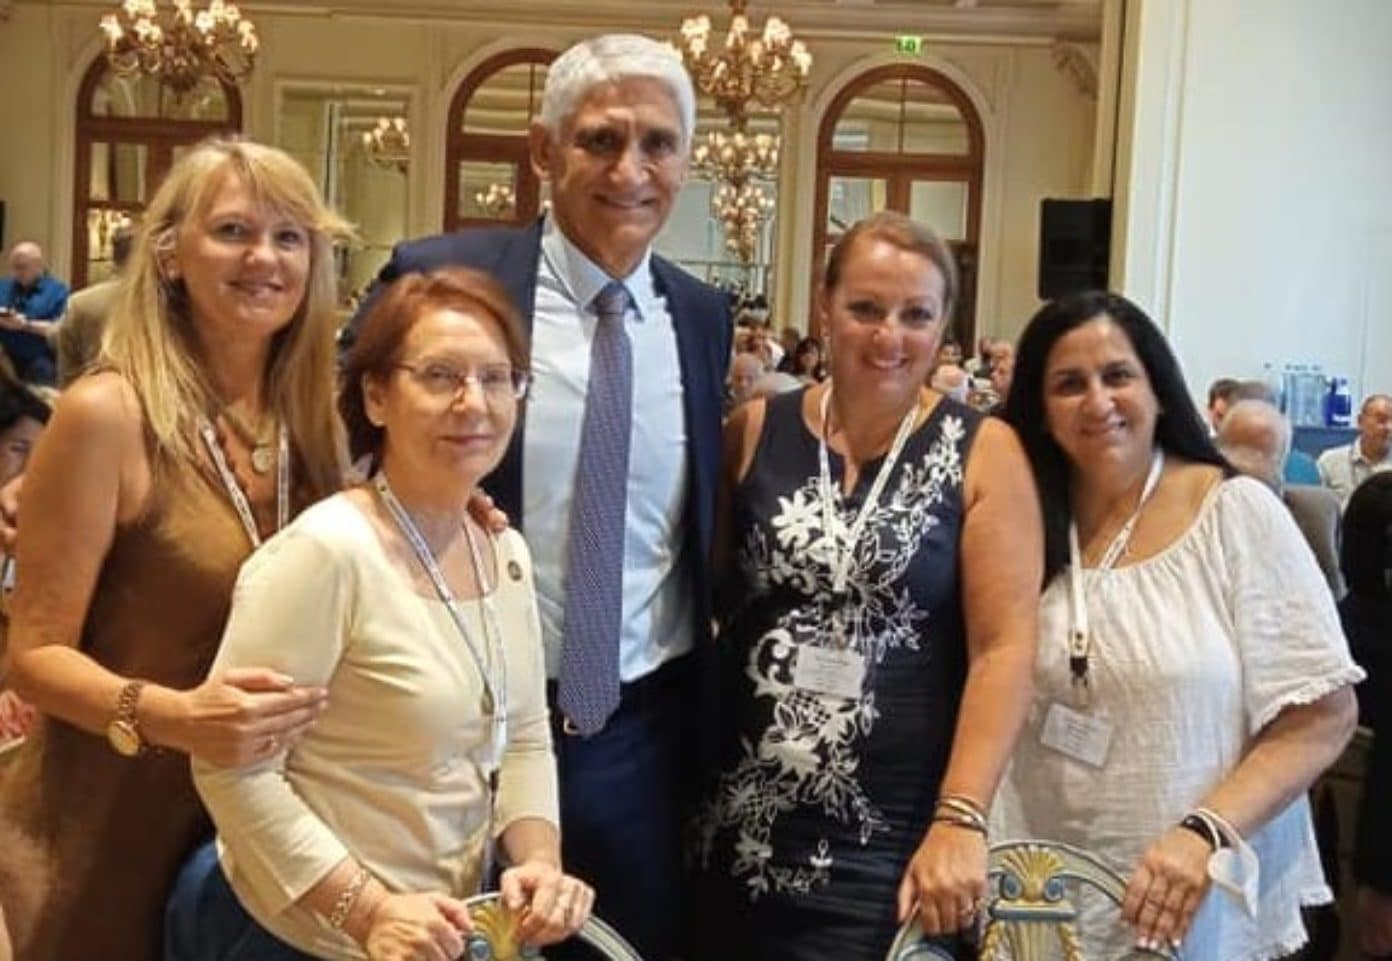 Giannakis with DOP members